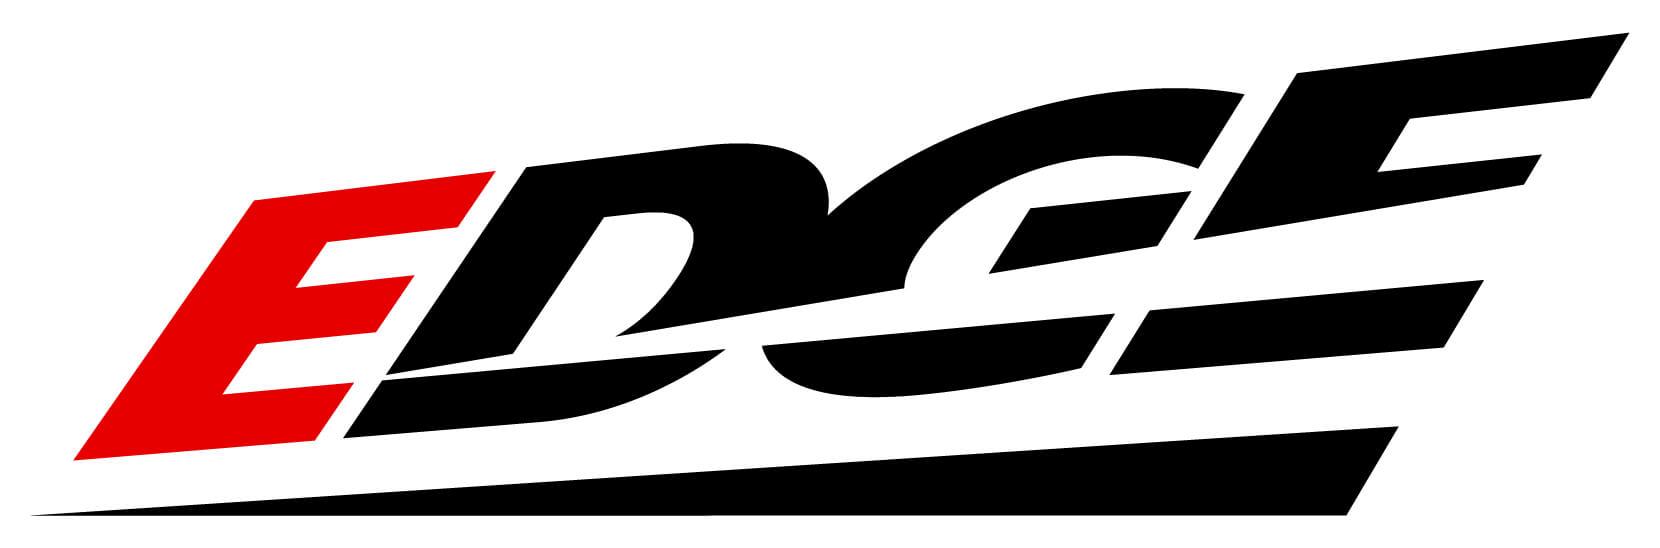 Edge Tuner Engine Logo